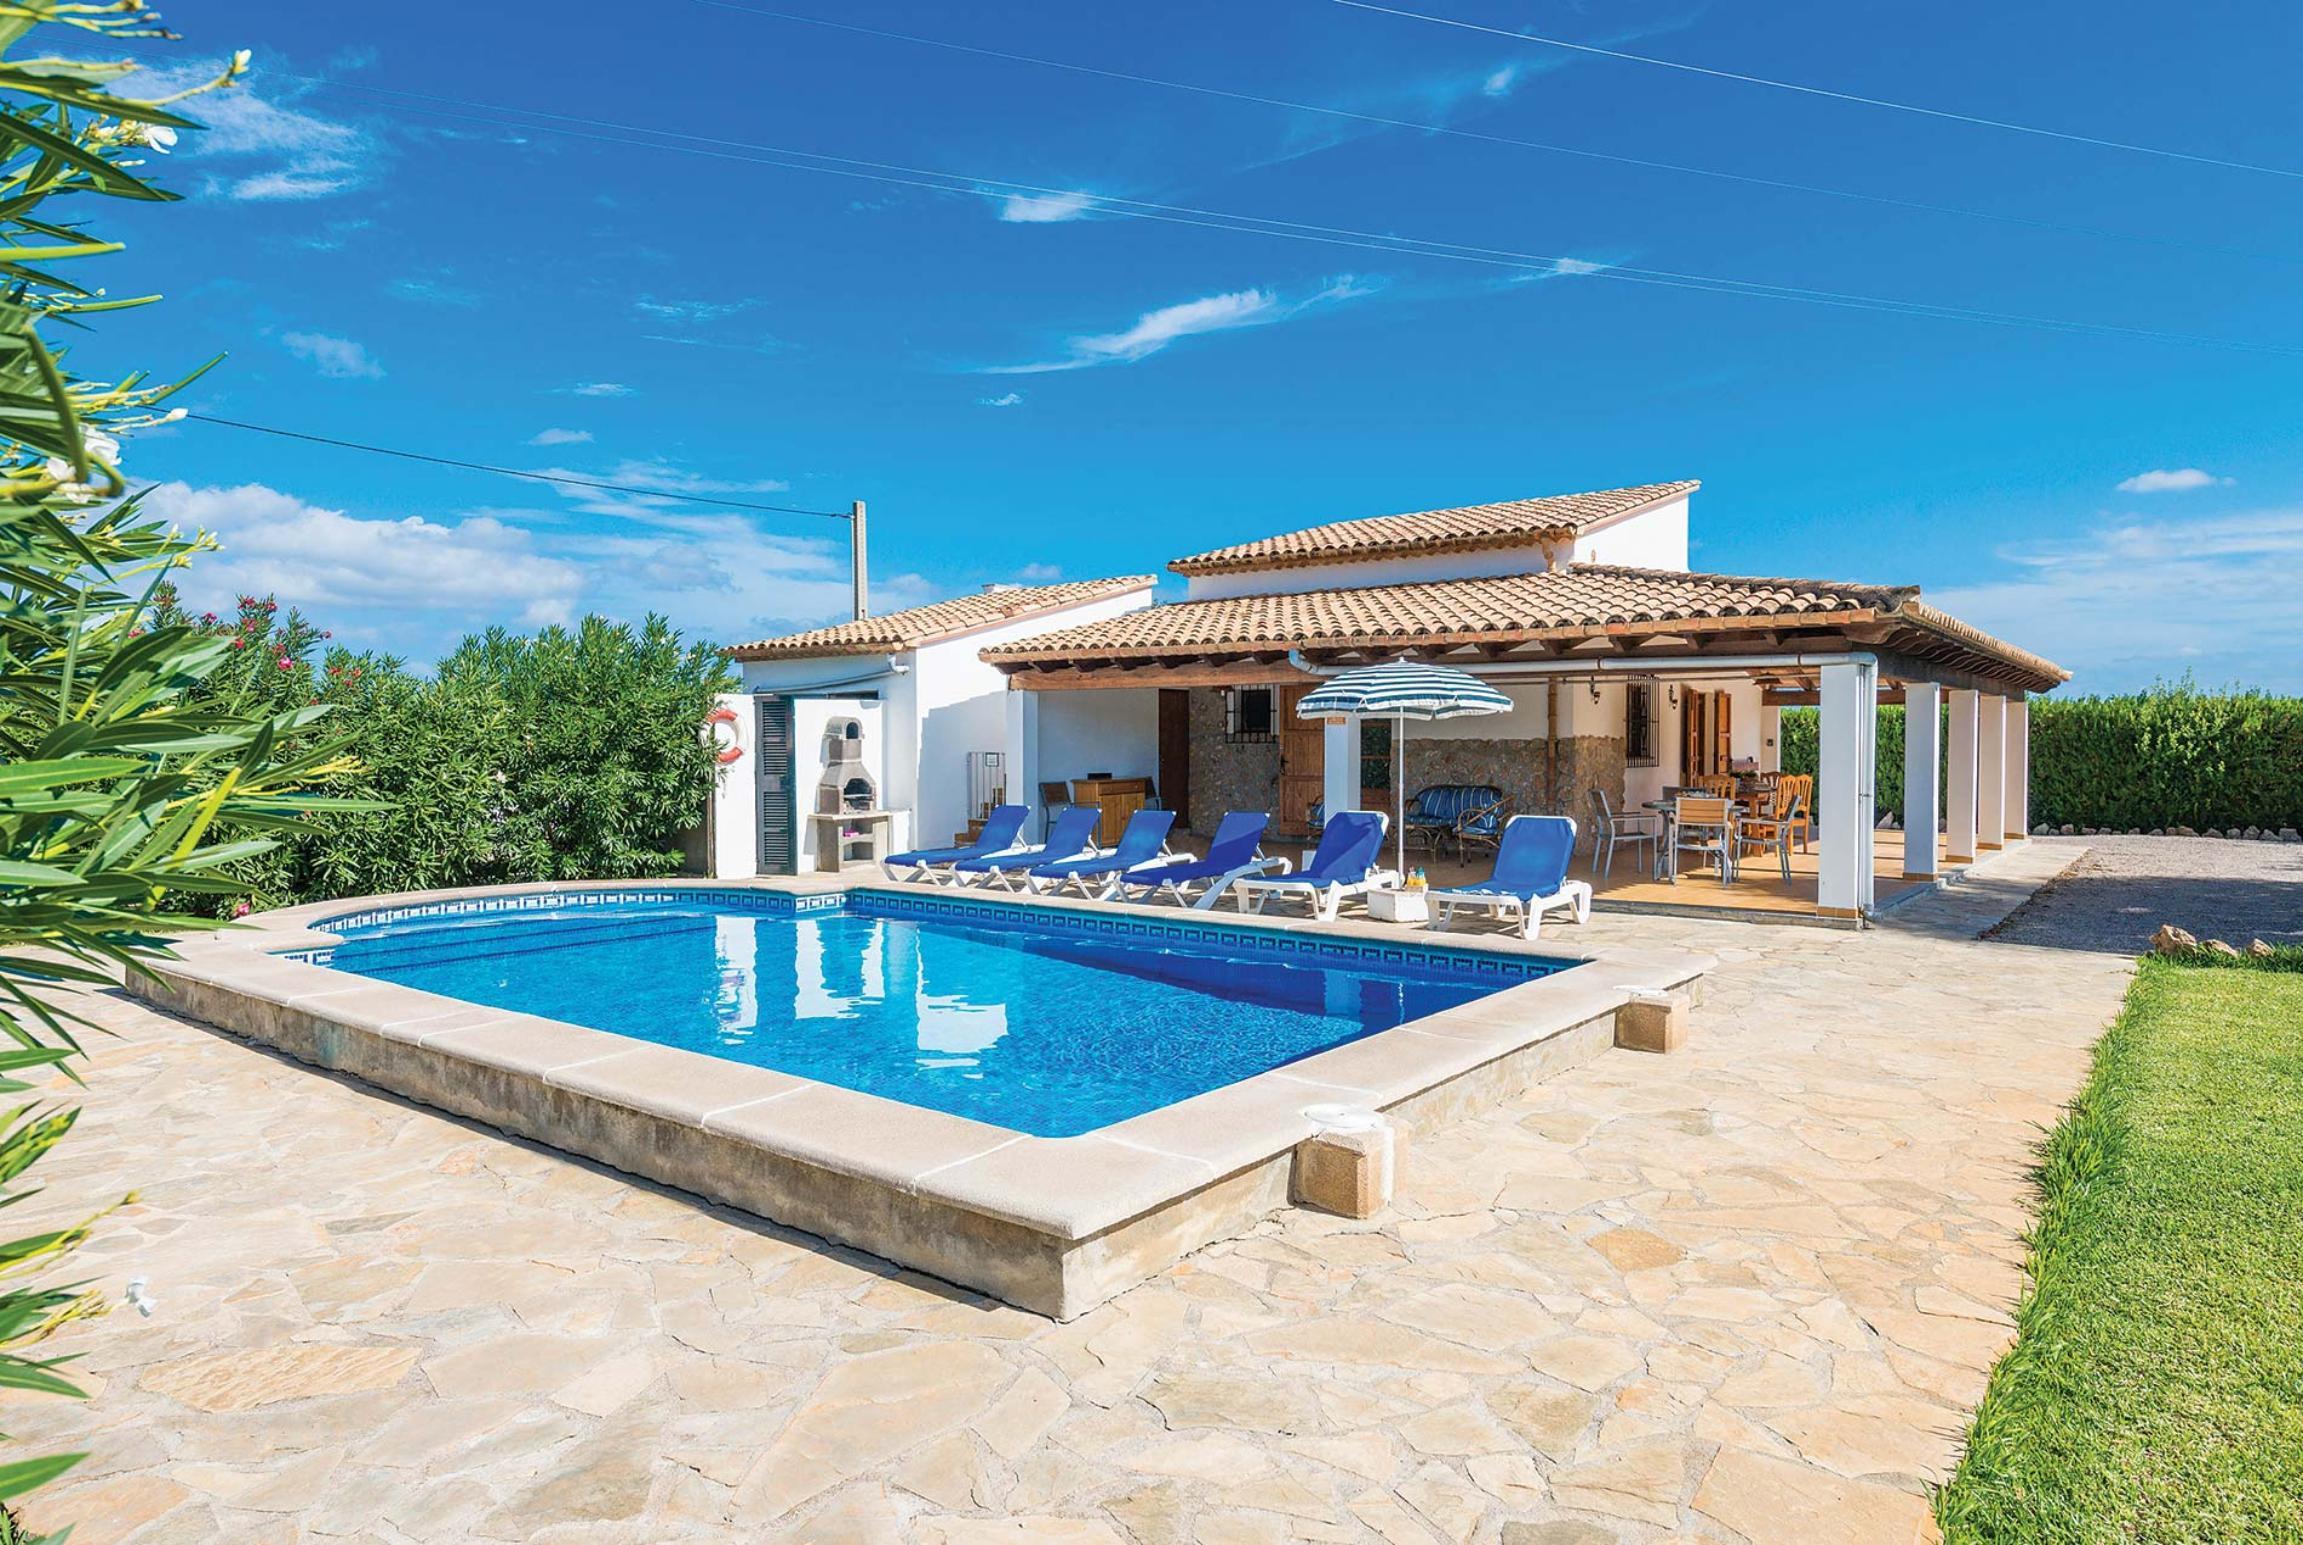 Ferienhaus Rasca (2654350), Formentor, Mallorca, Balearische Inseln, Spanien, Bild 12